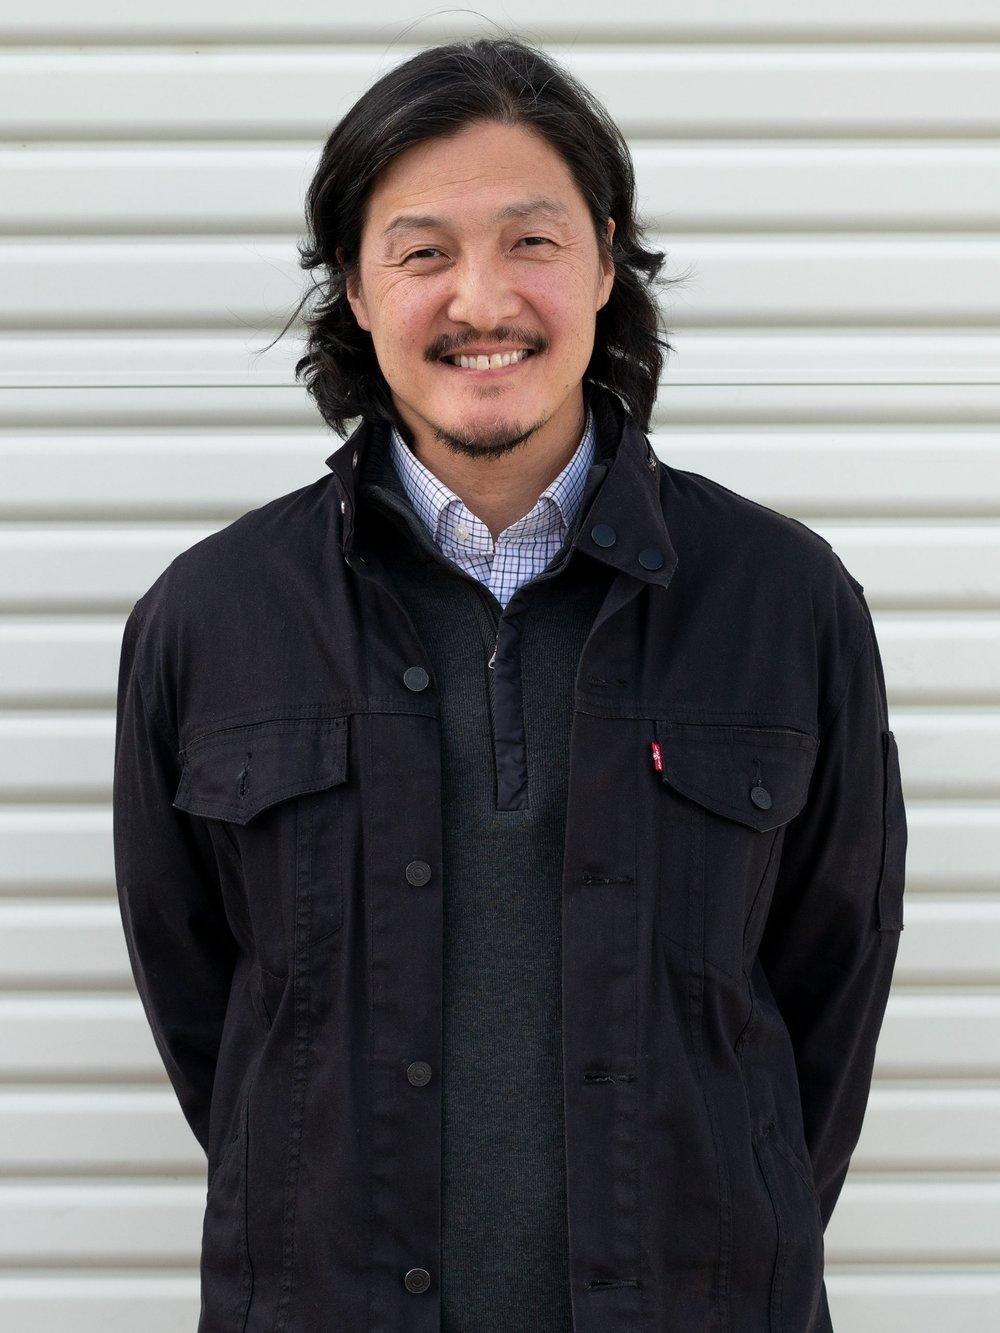 SEUNG CHUNG - PresidentAbout Seung